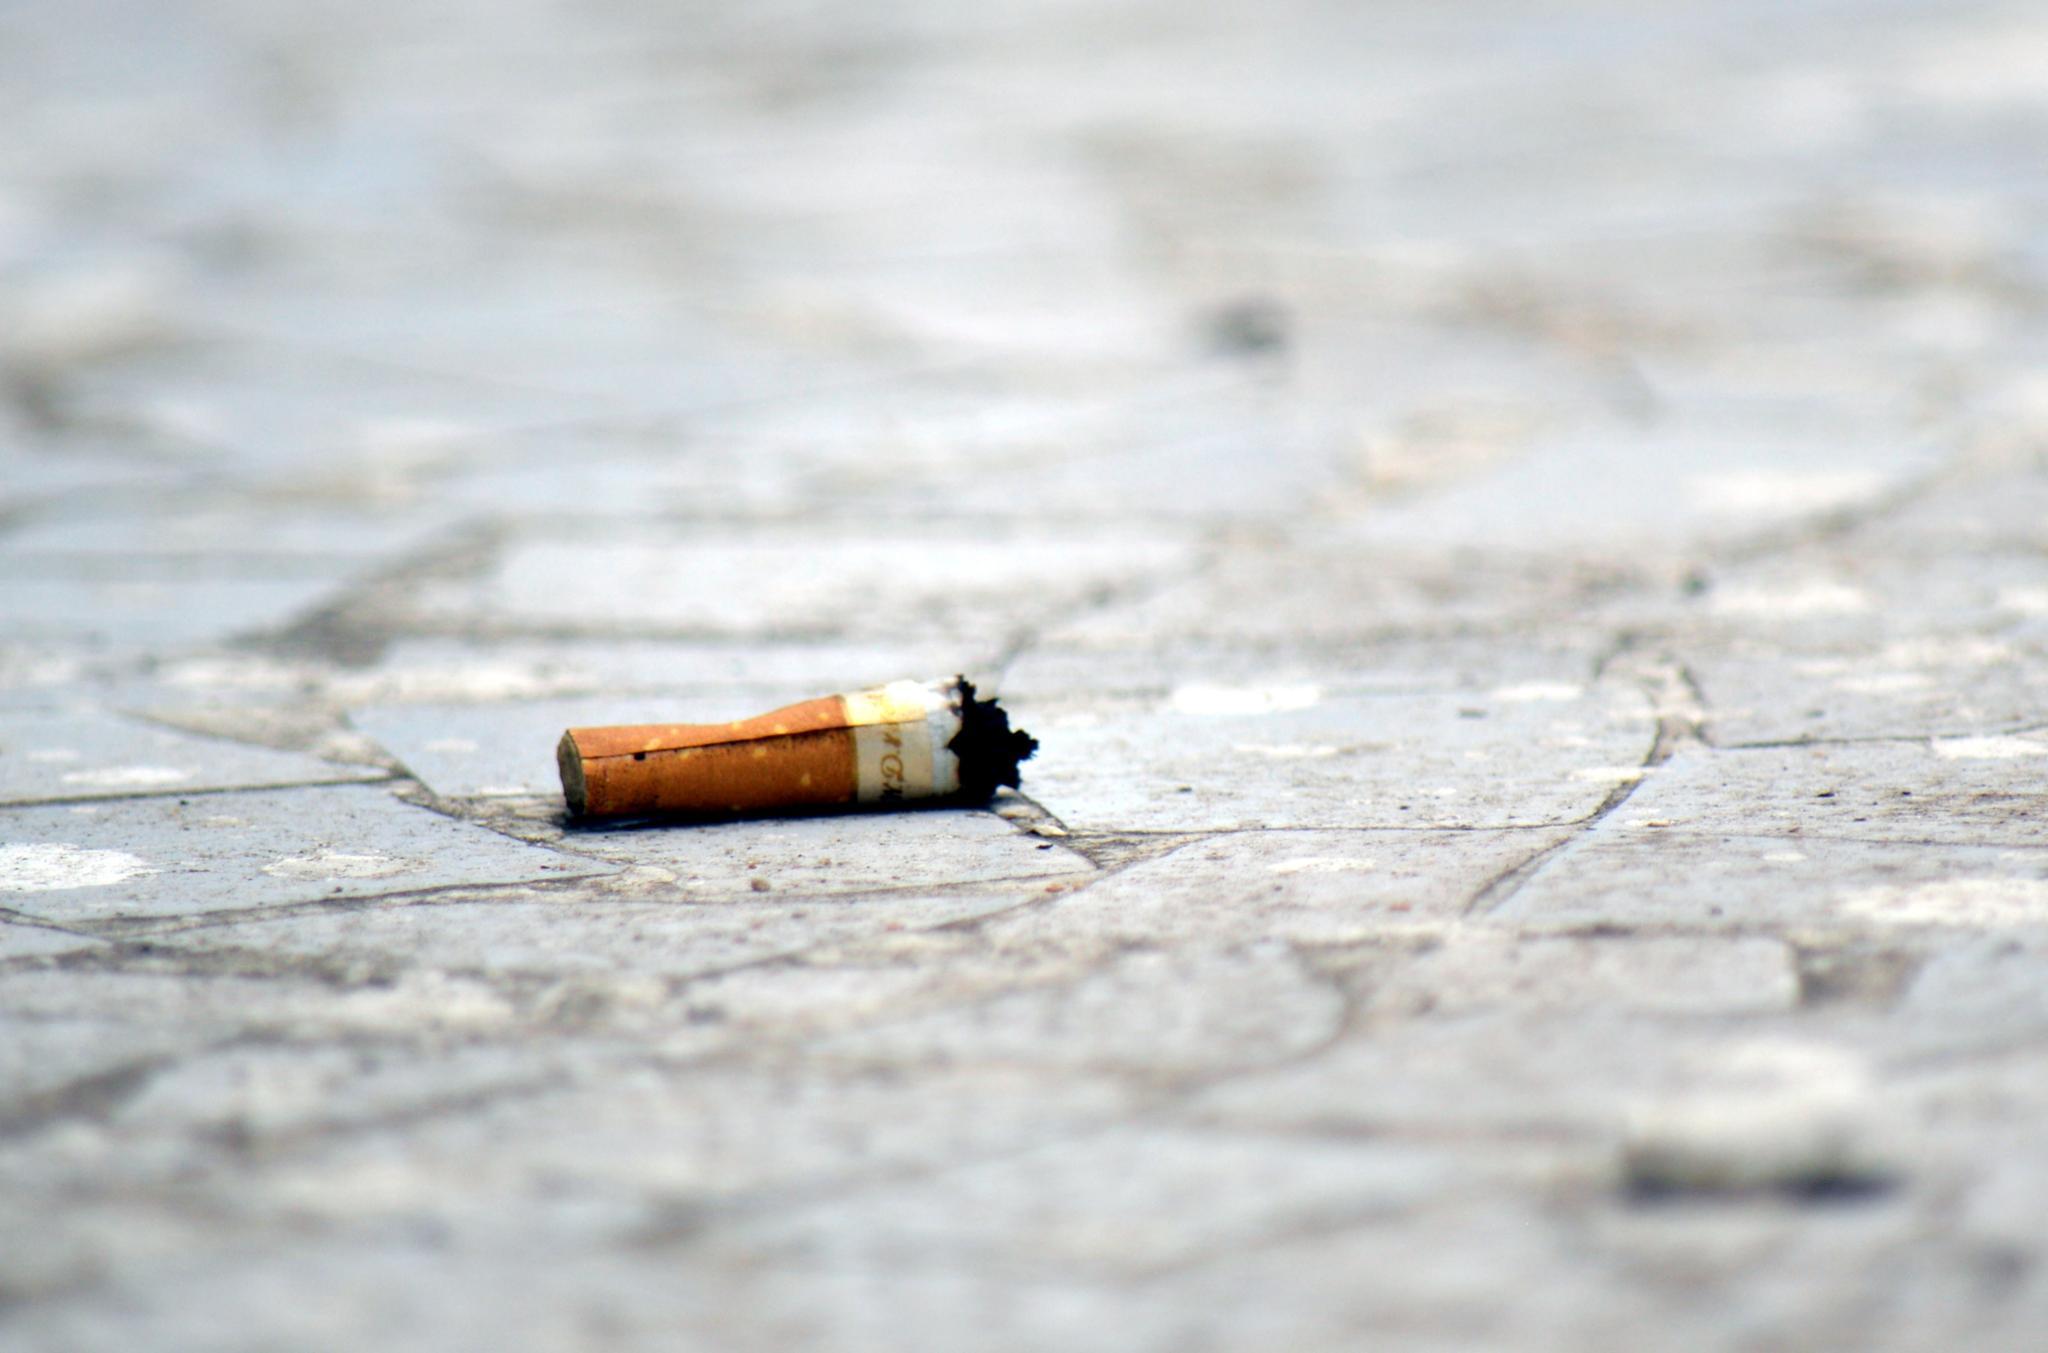 Smoking Kills by tejas.patel.9235199